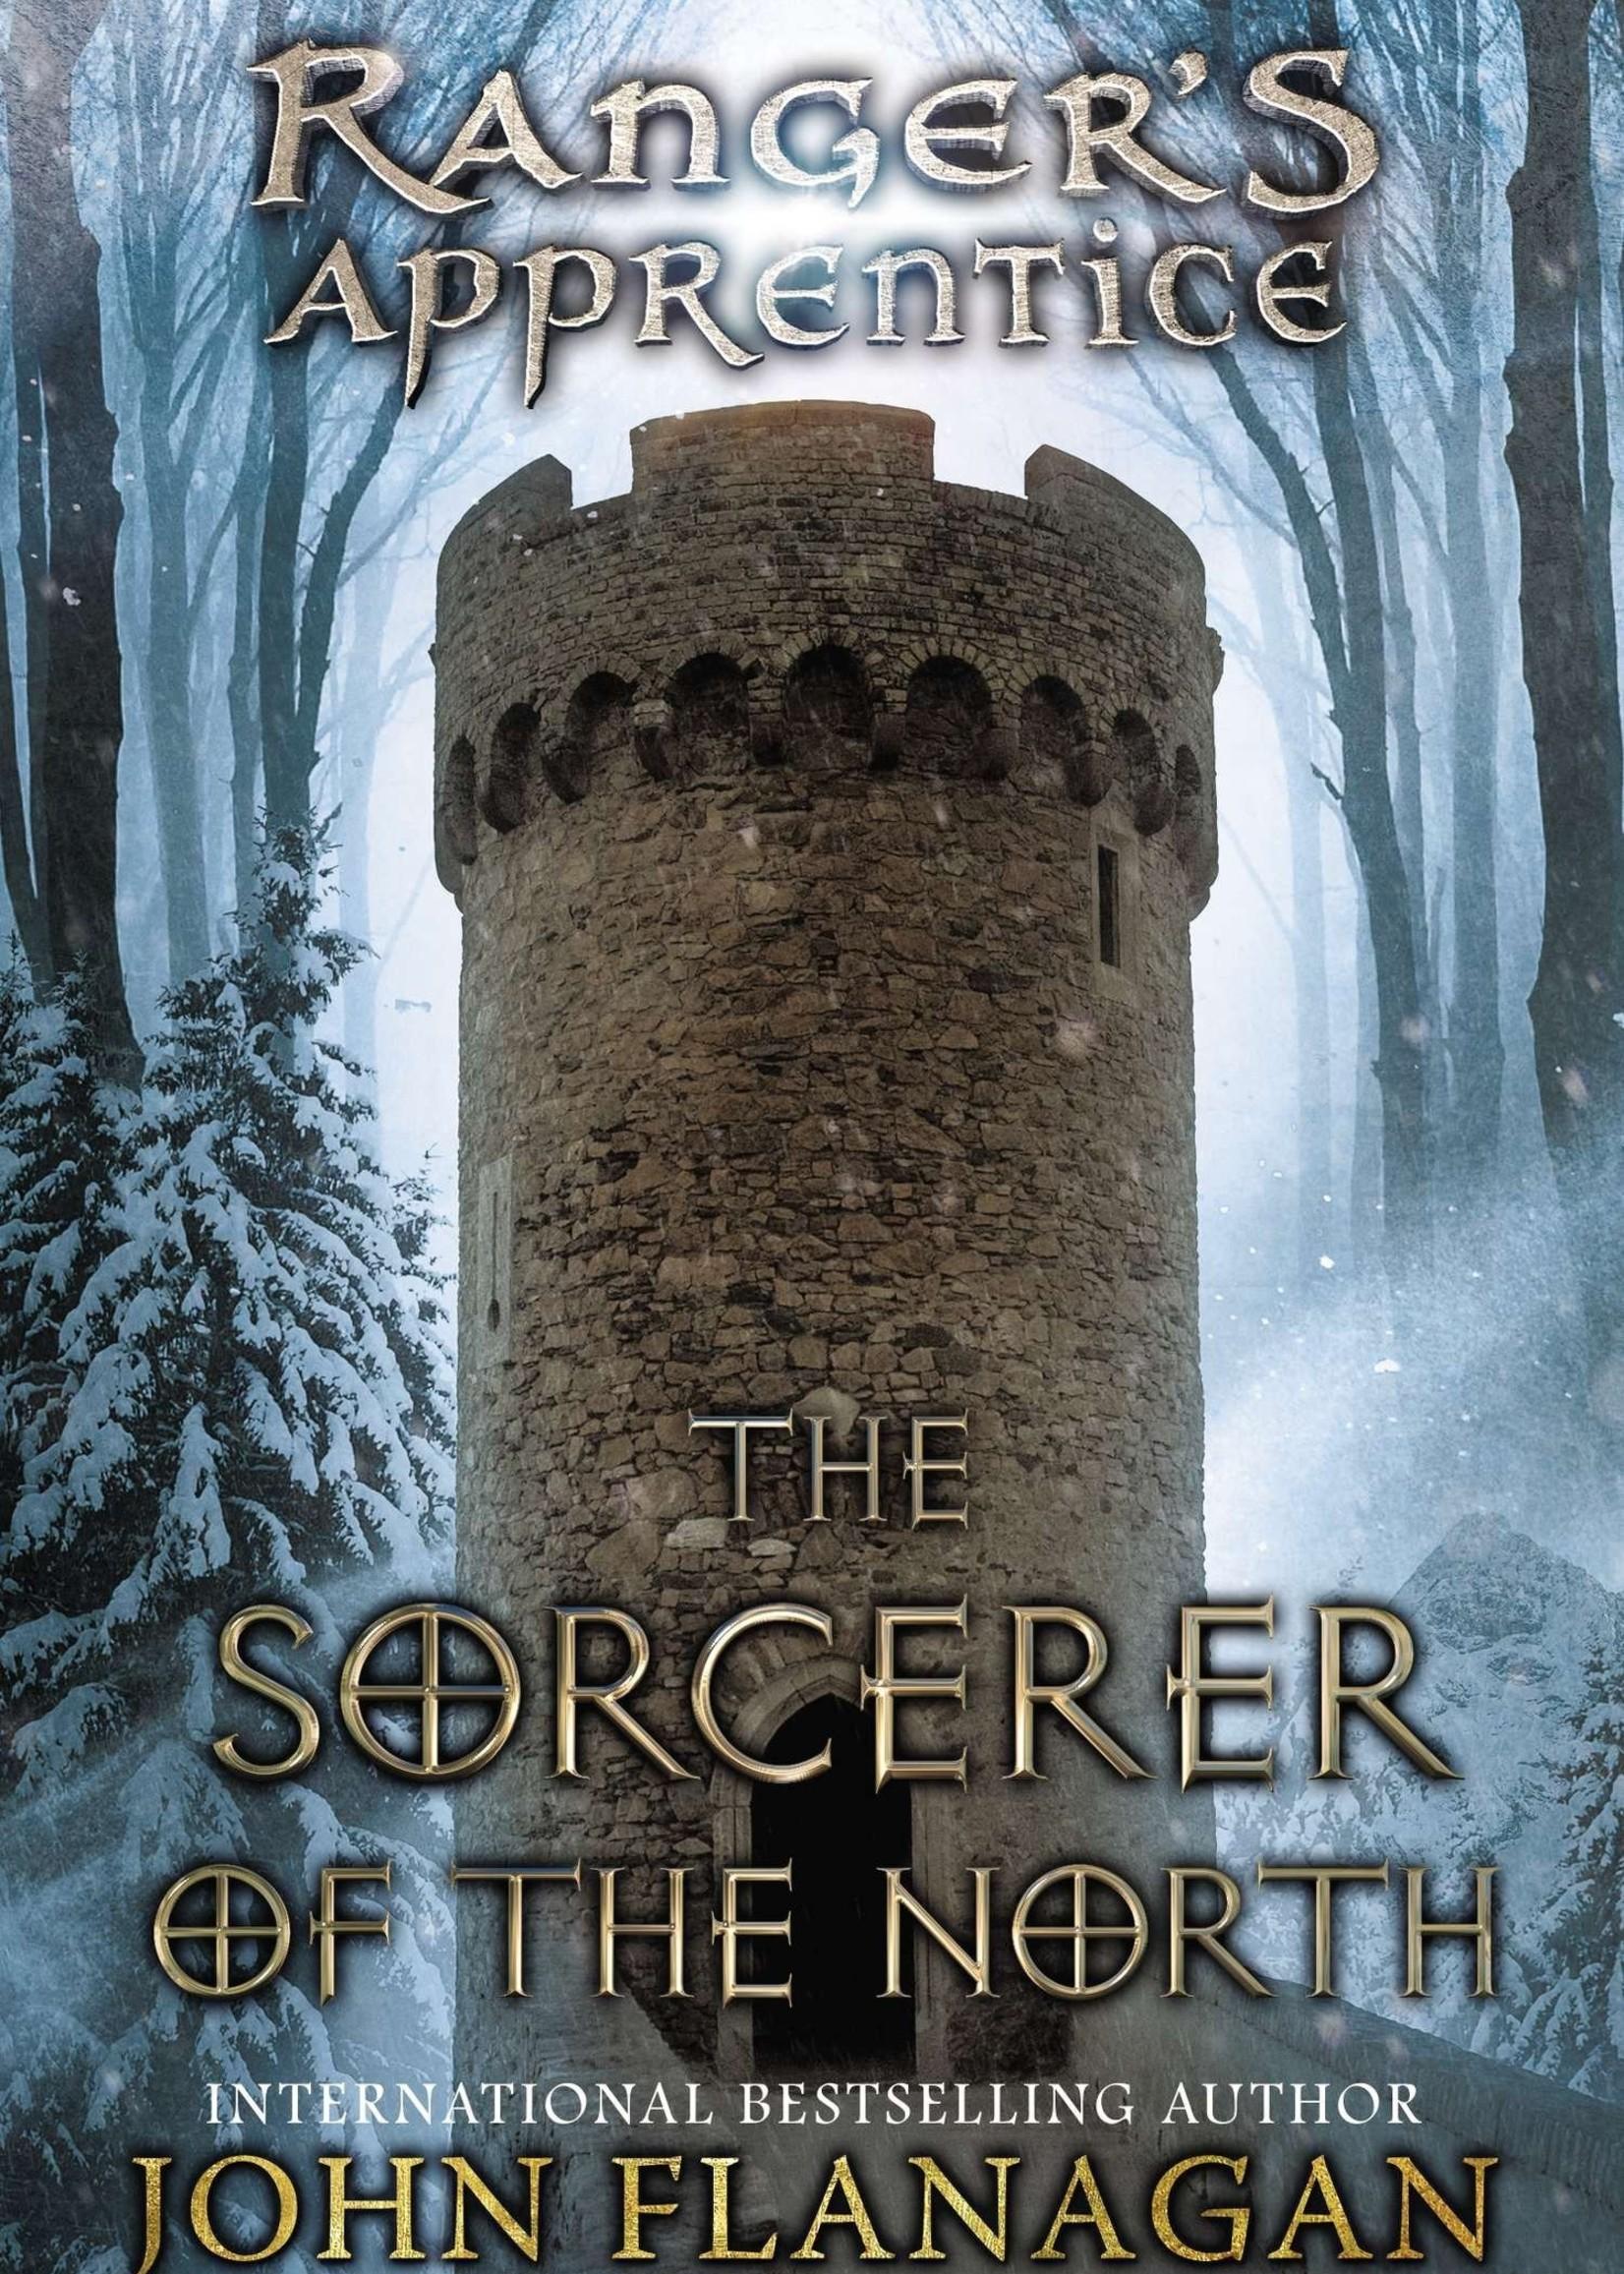 Ranger's Apprentice #05, The Sorcerer of The North - Paperback